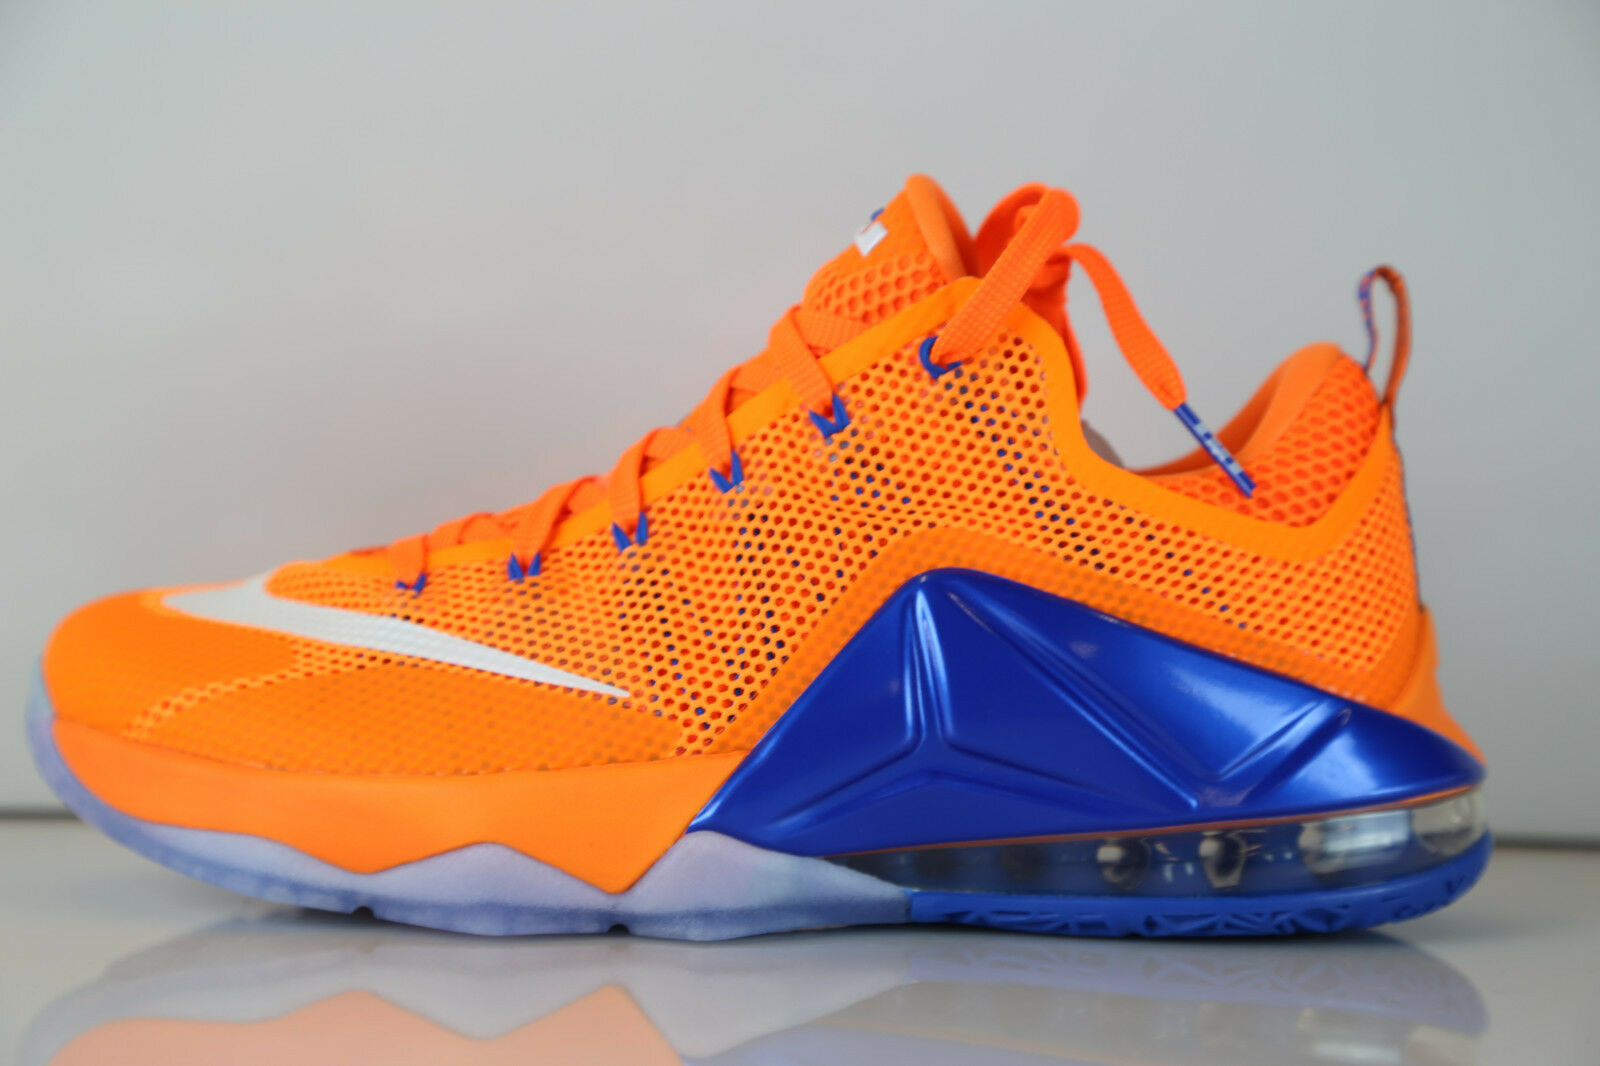 Nike Lebron XII Low Bright Citrus Total Orange 724557-838 7-14 12 8 9 10